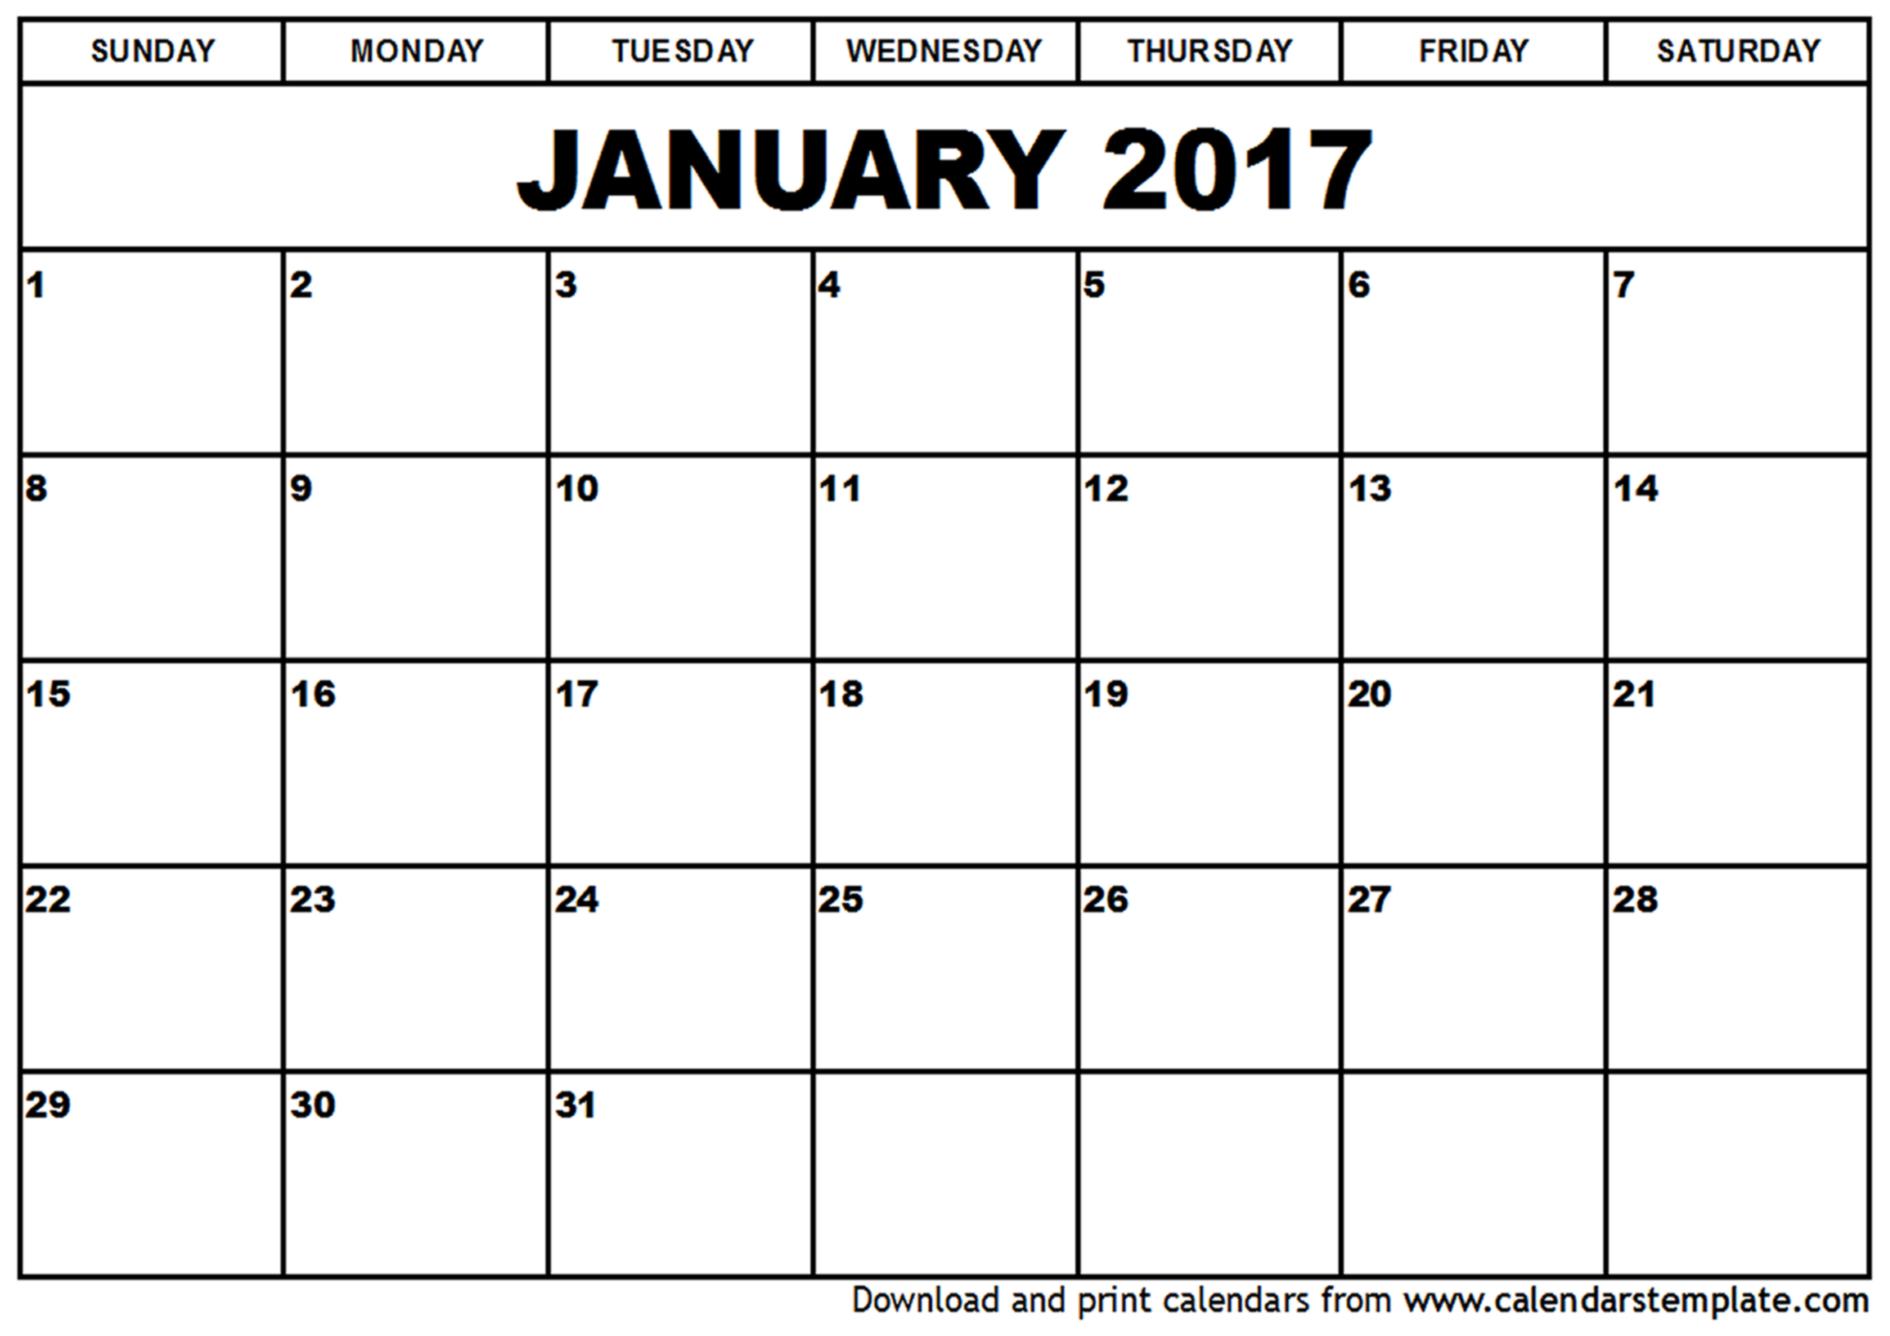 January 2017 Calendar PDF